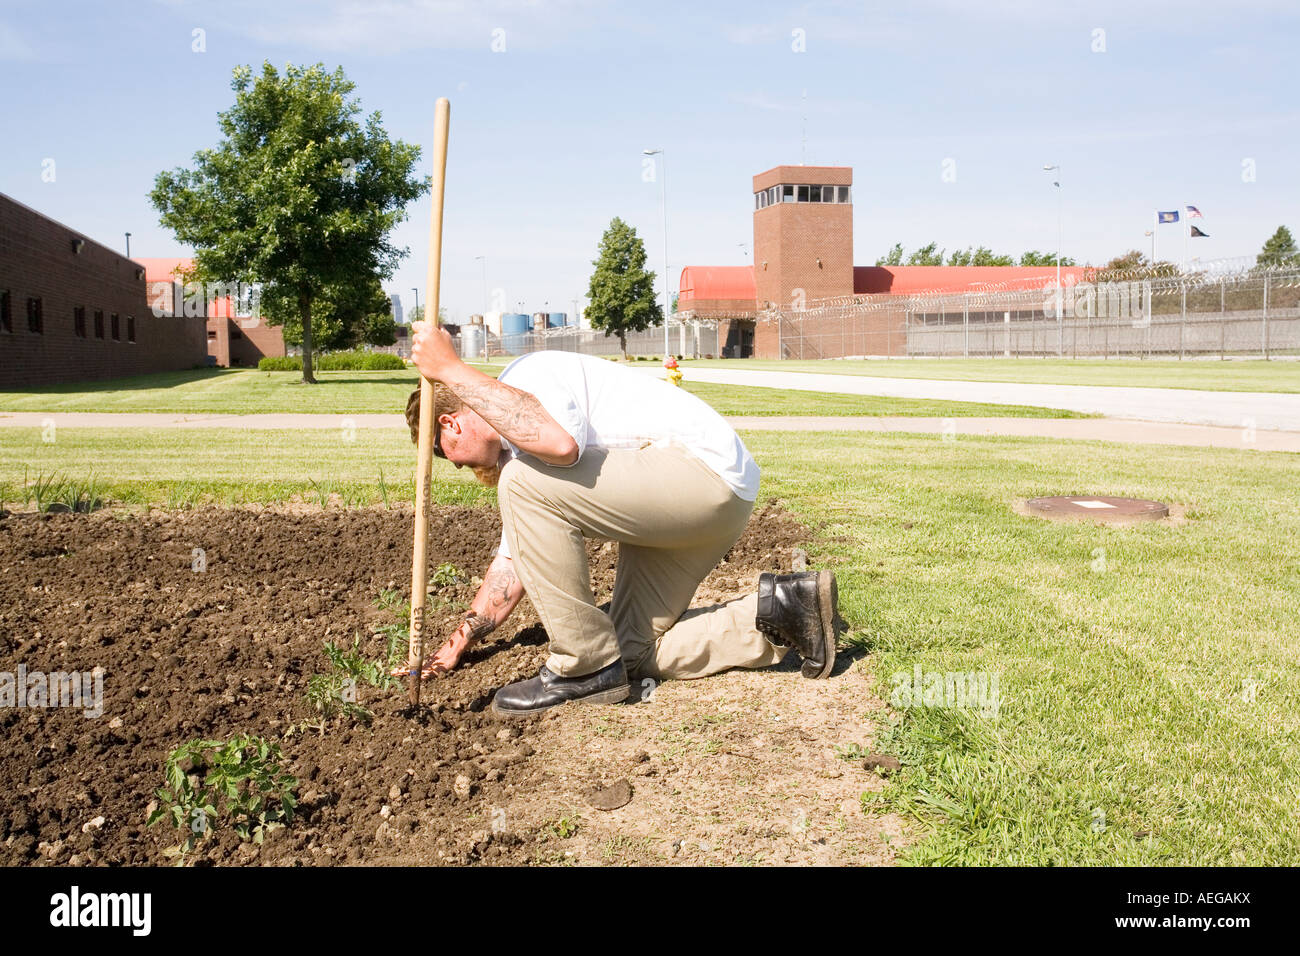 Inmate Working In Garden Inside The Omaha Correctional Center Omaha  Nebraska USA